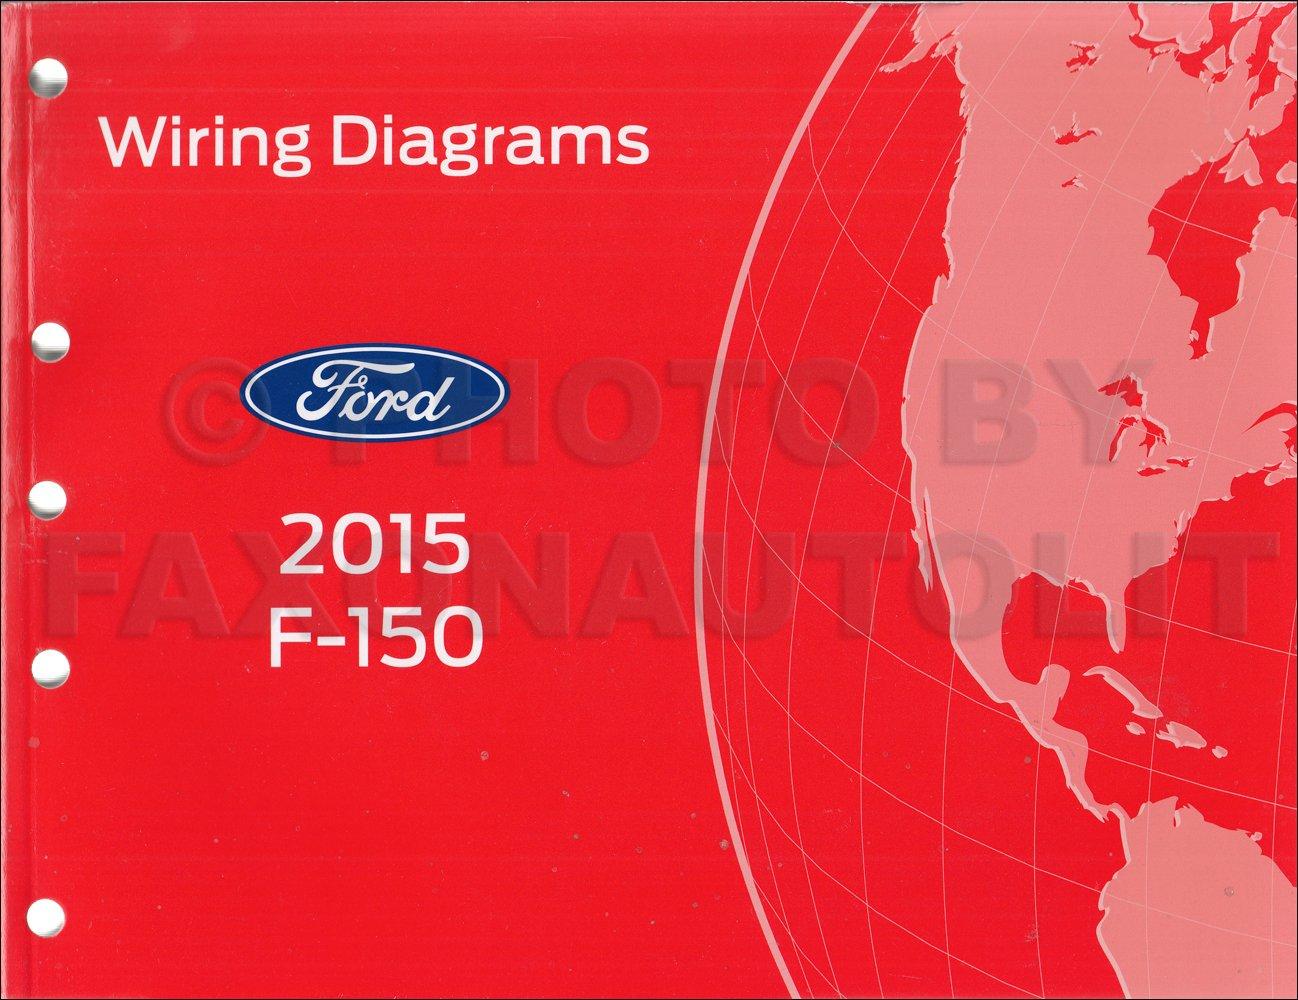 2015 Ford F 150 Wiring Diagram Manual Original Ford Amazon Com Books